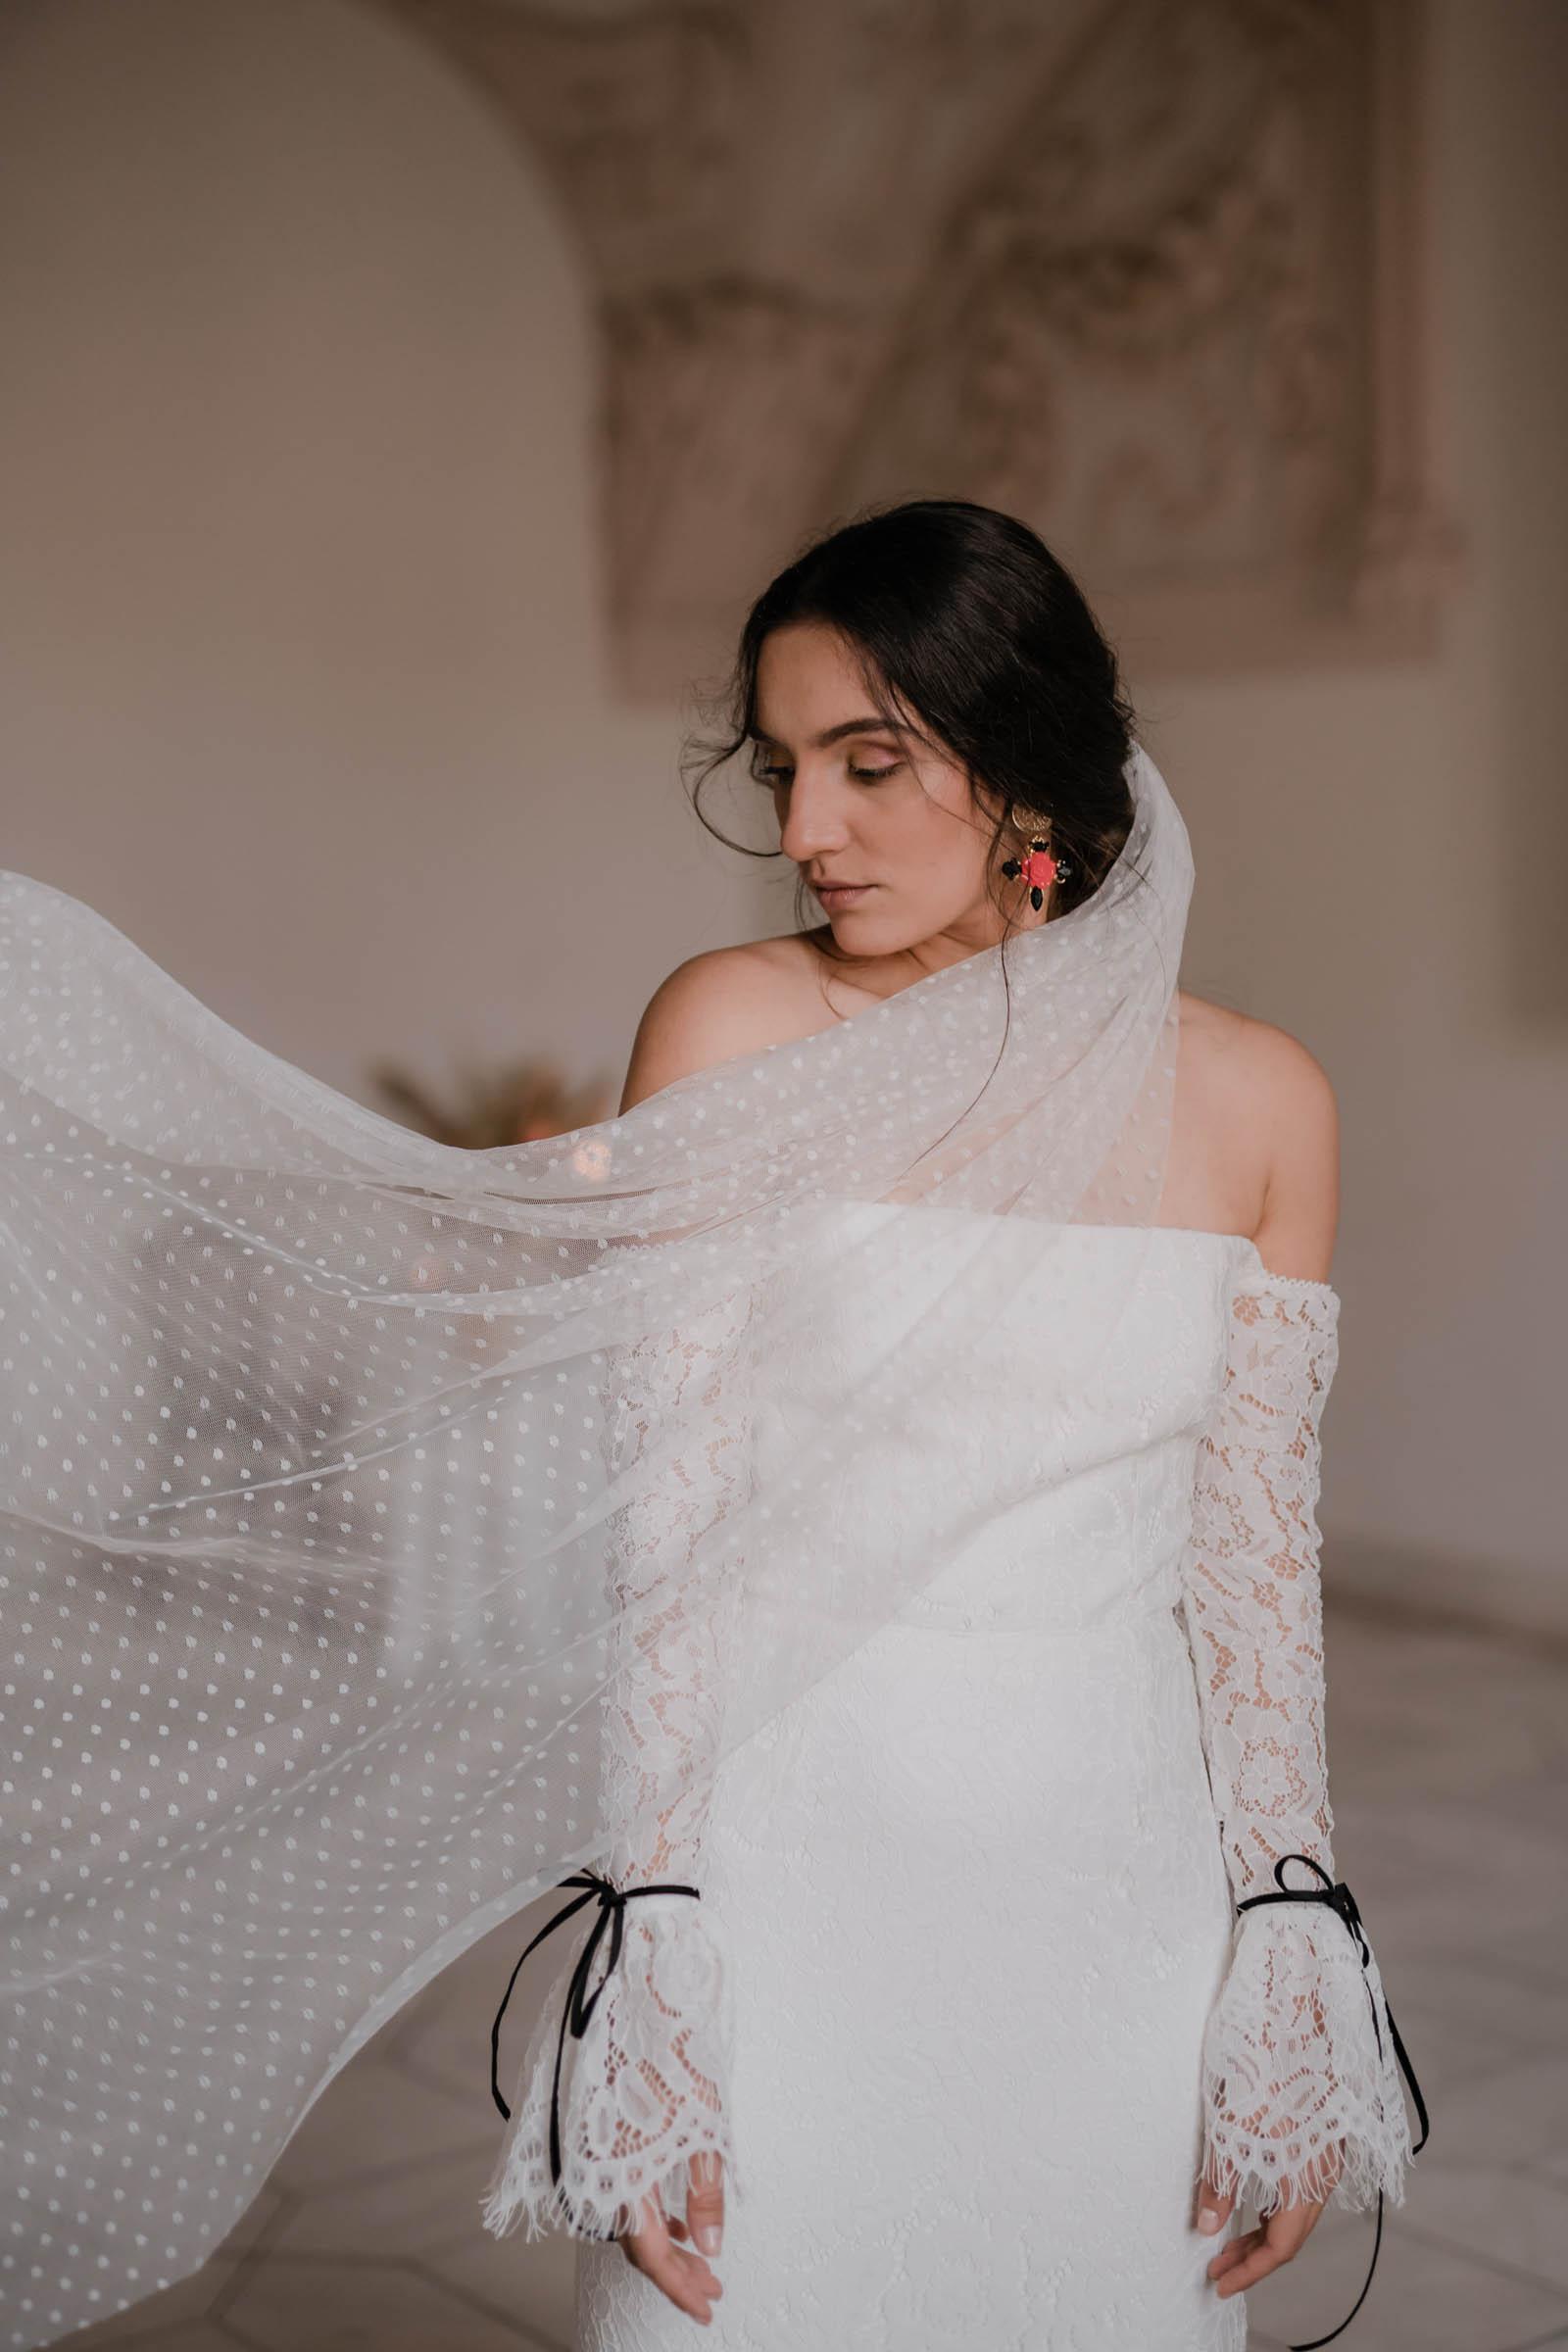 boho-svadobne-saty-veronika-kostkova-wedding-atelier-kolekcia-2019-alba-4